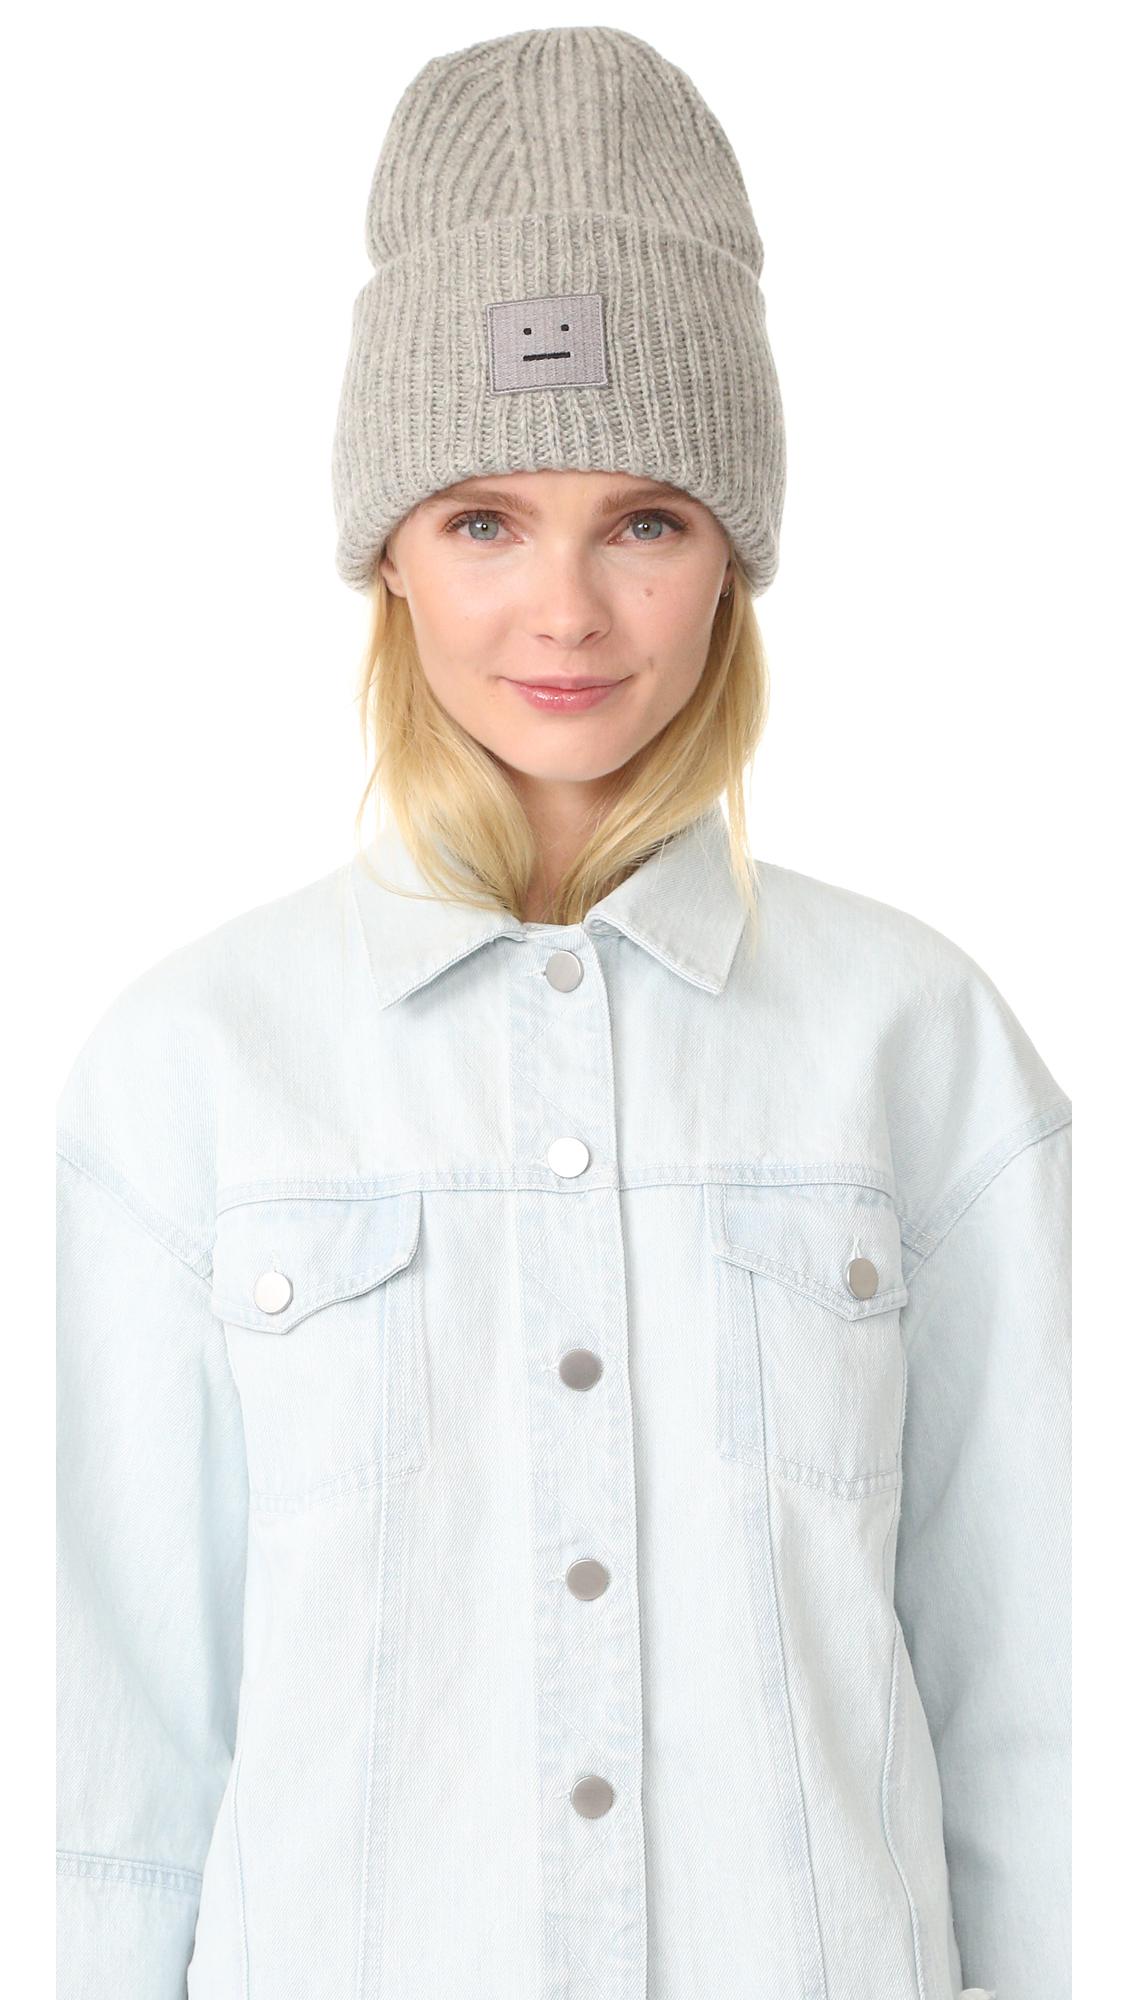 Acne Studios Pansy Wool Hat - Silver Melange at Shopbop